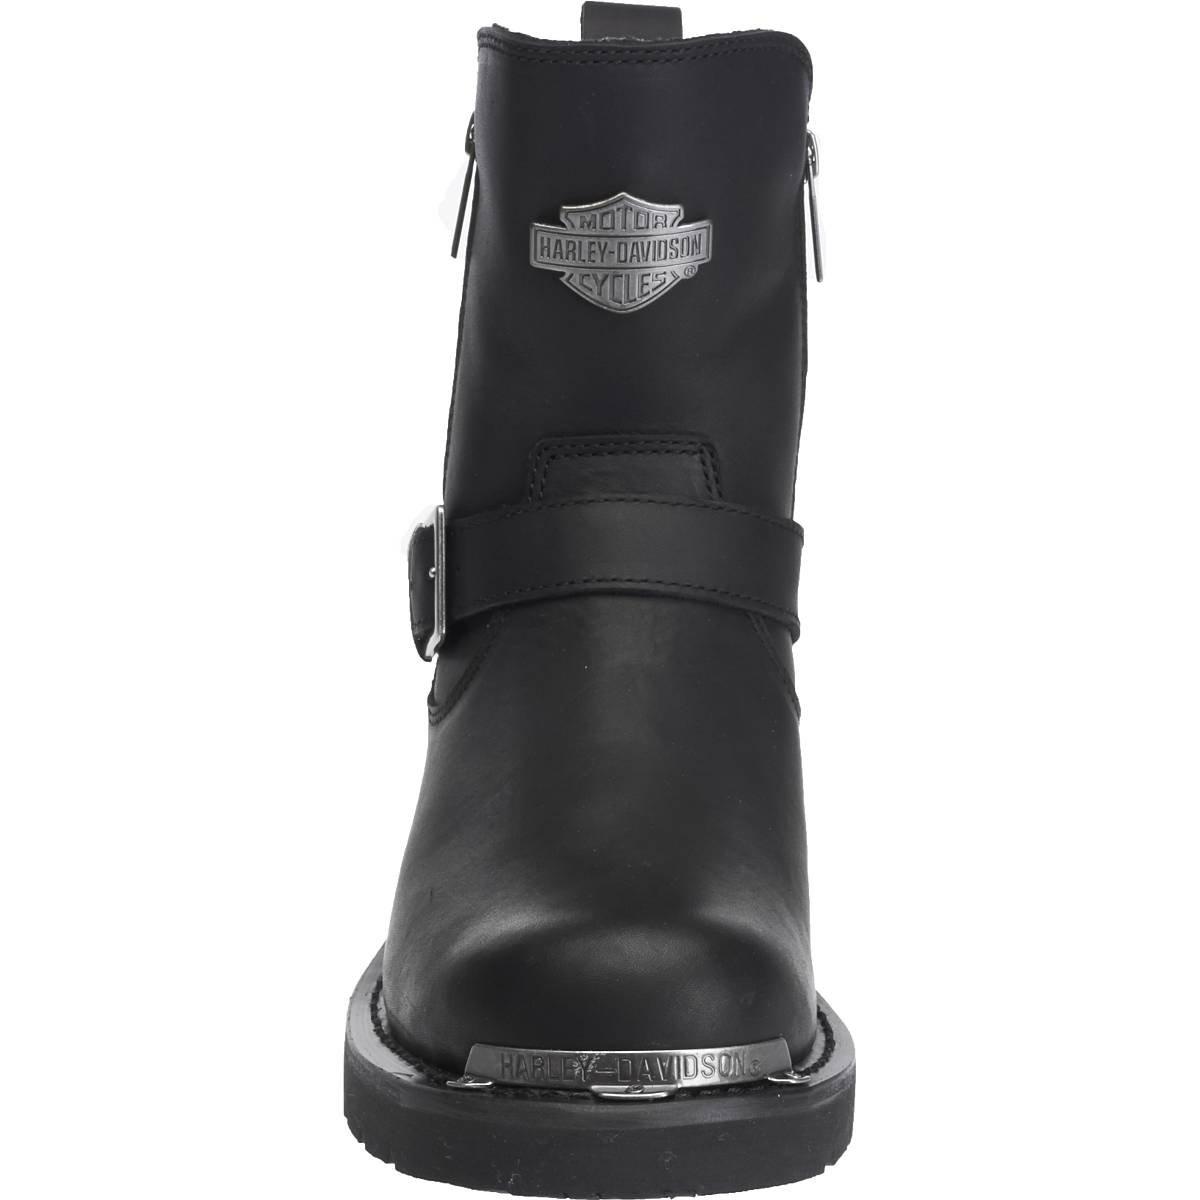 D96090 Harley Davidson Startex ShoesSchwarzAmazon Herren Rjcq53A4L